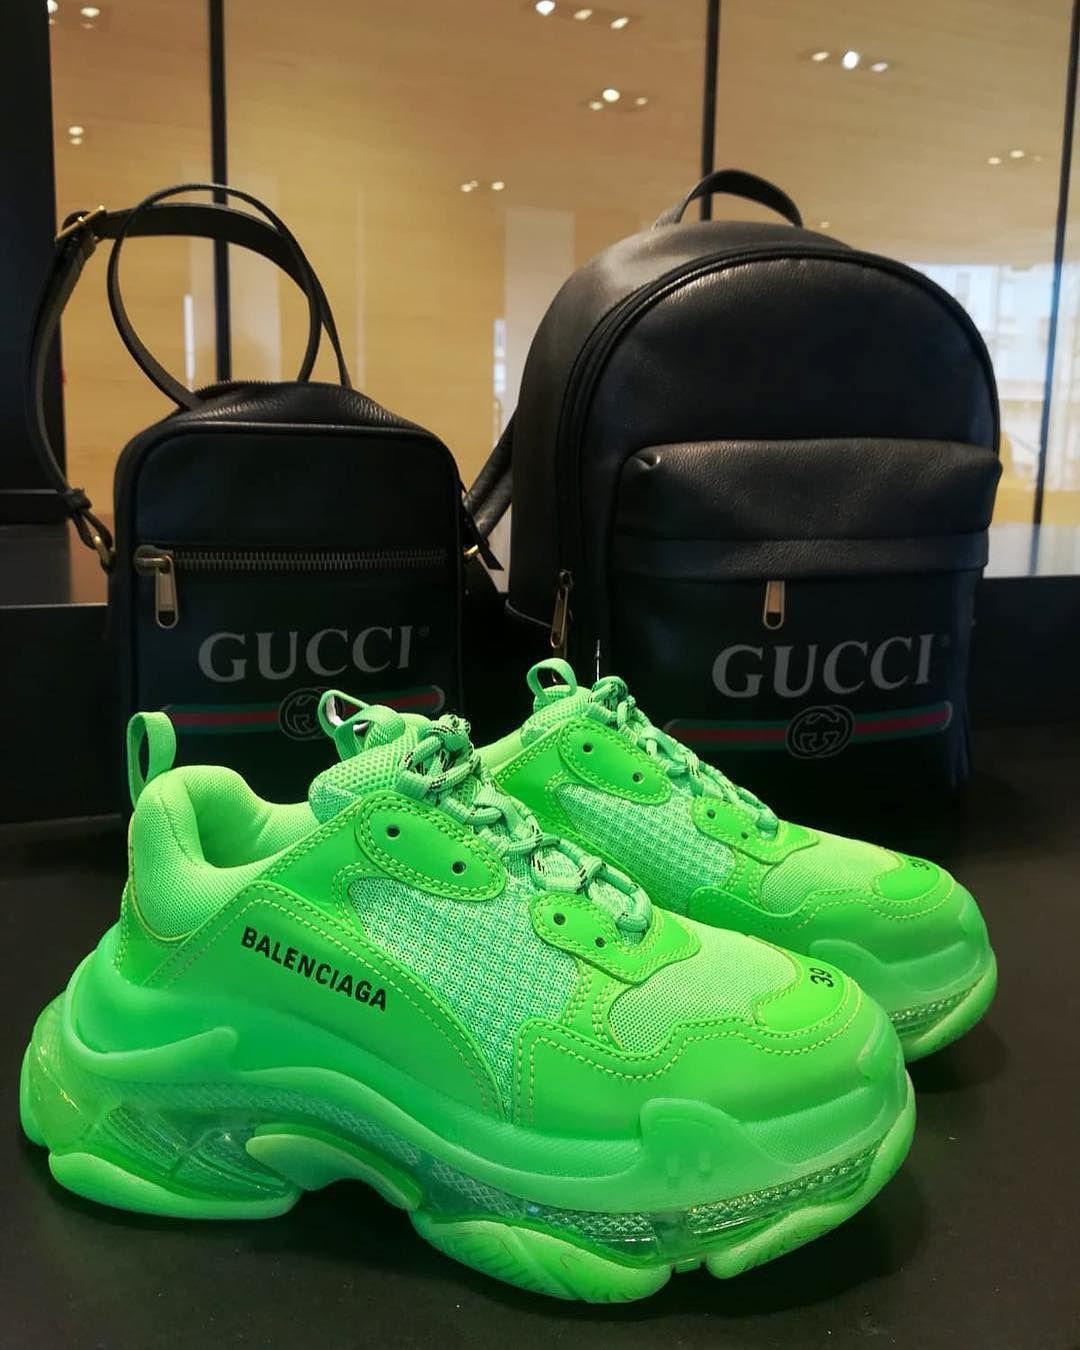 timeless design 3a840 e780b Balenciaga sneakers triple s clear sole neon green | Via ...